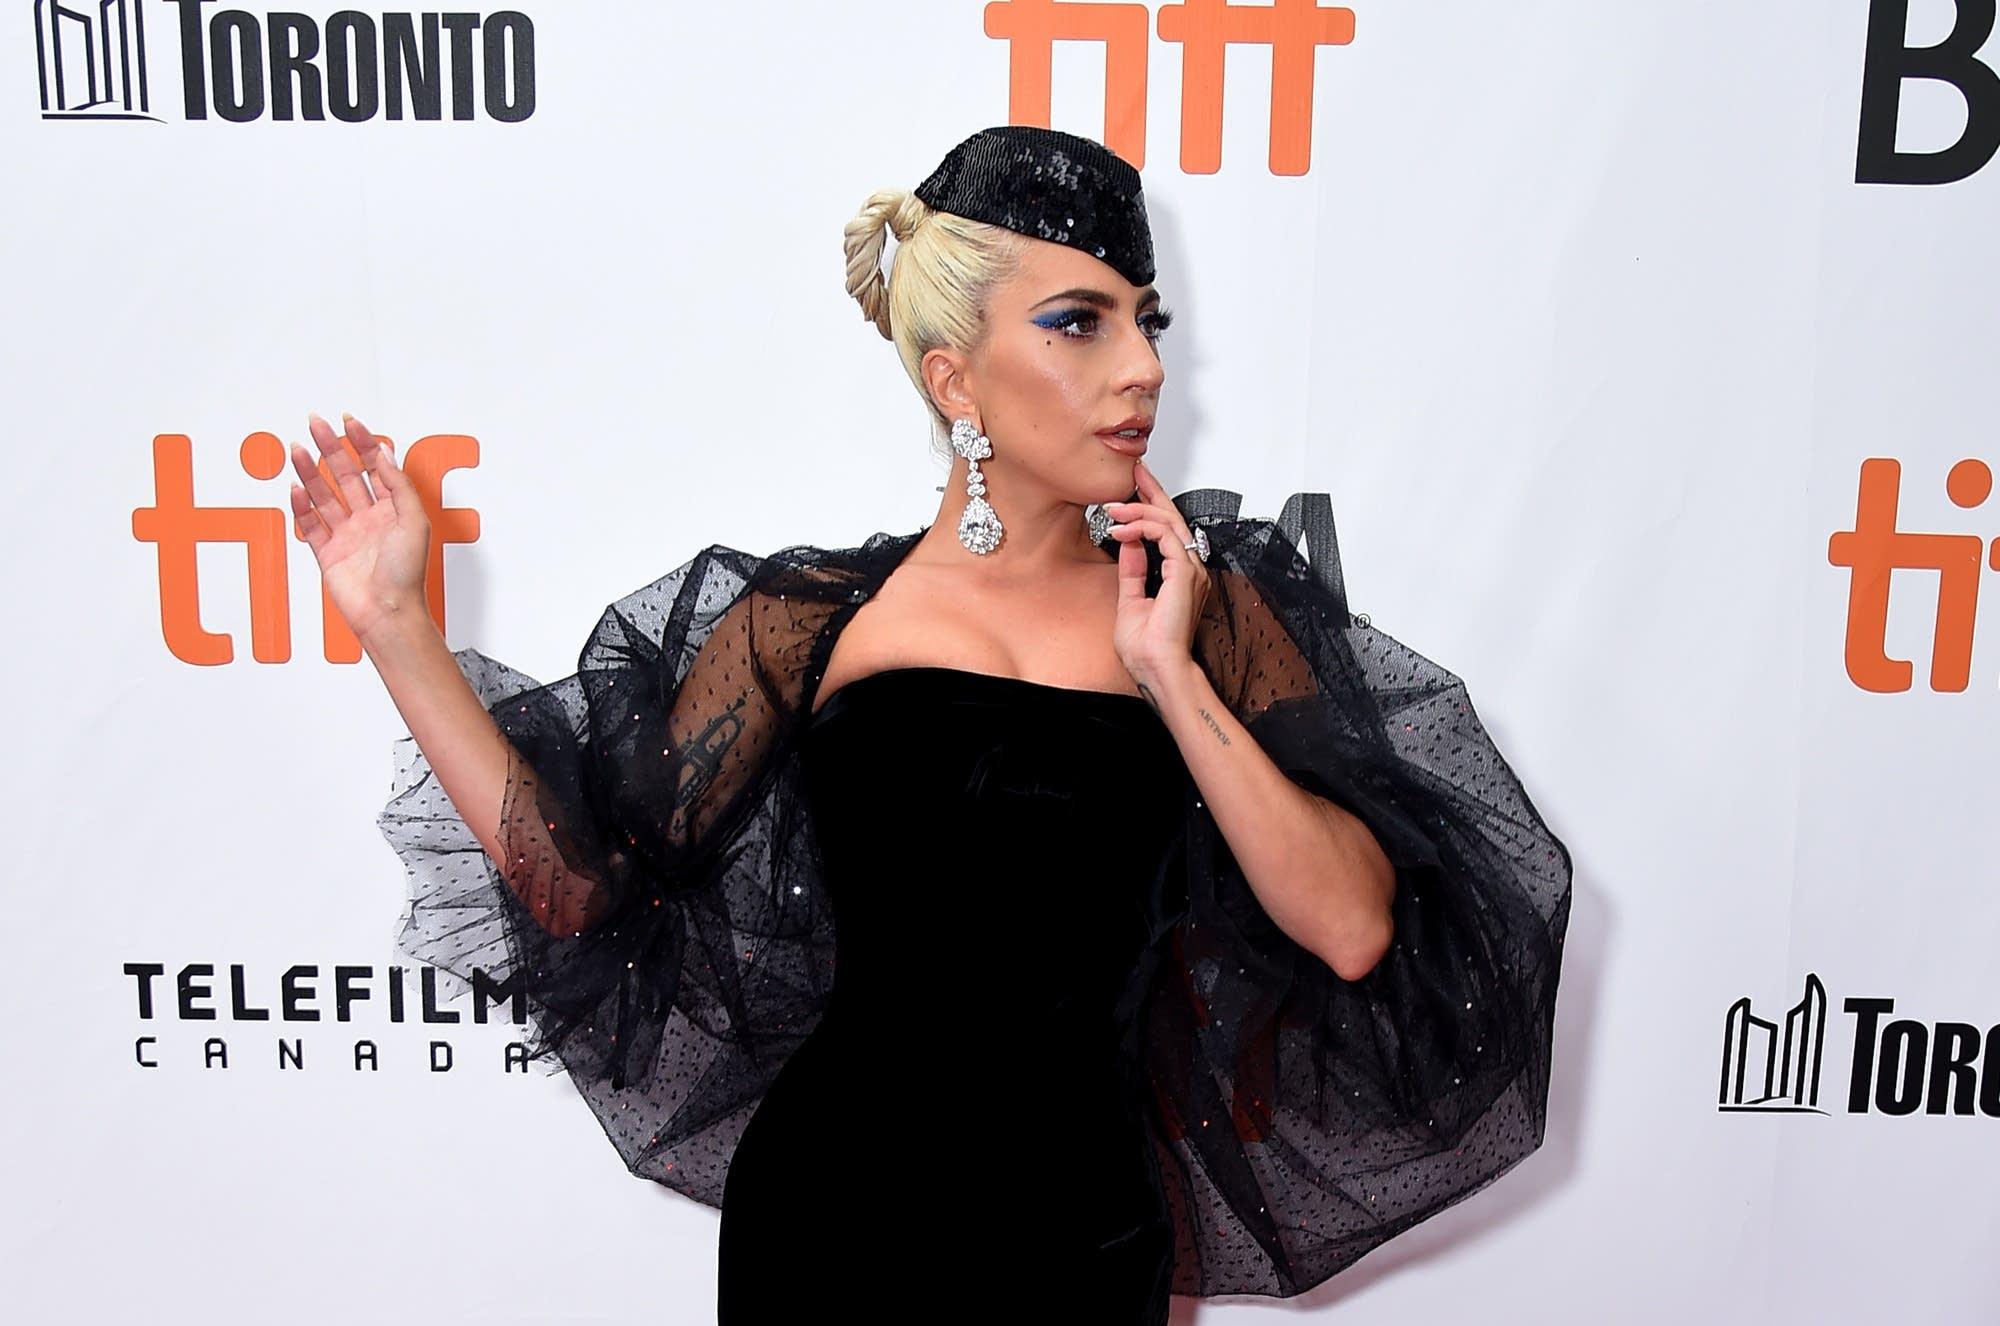 Lady Gaga at the Toronto International Film Festival